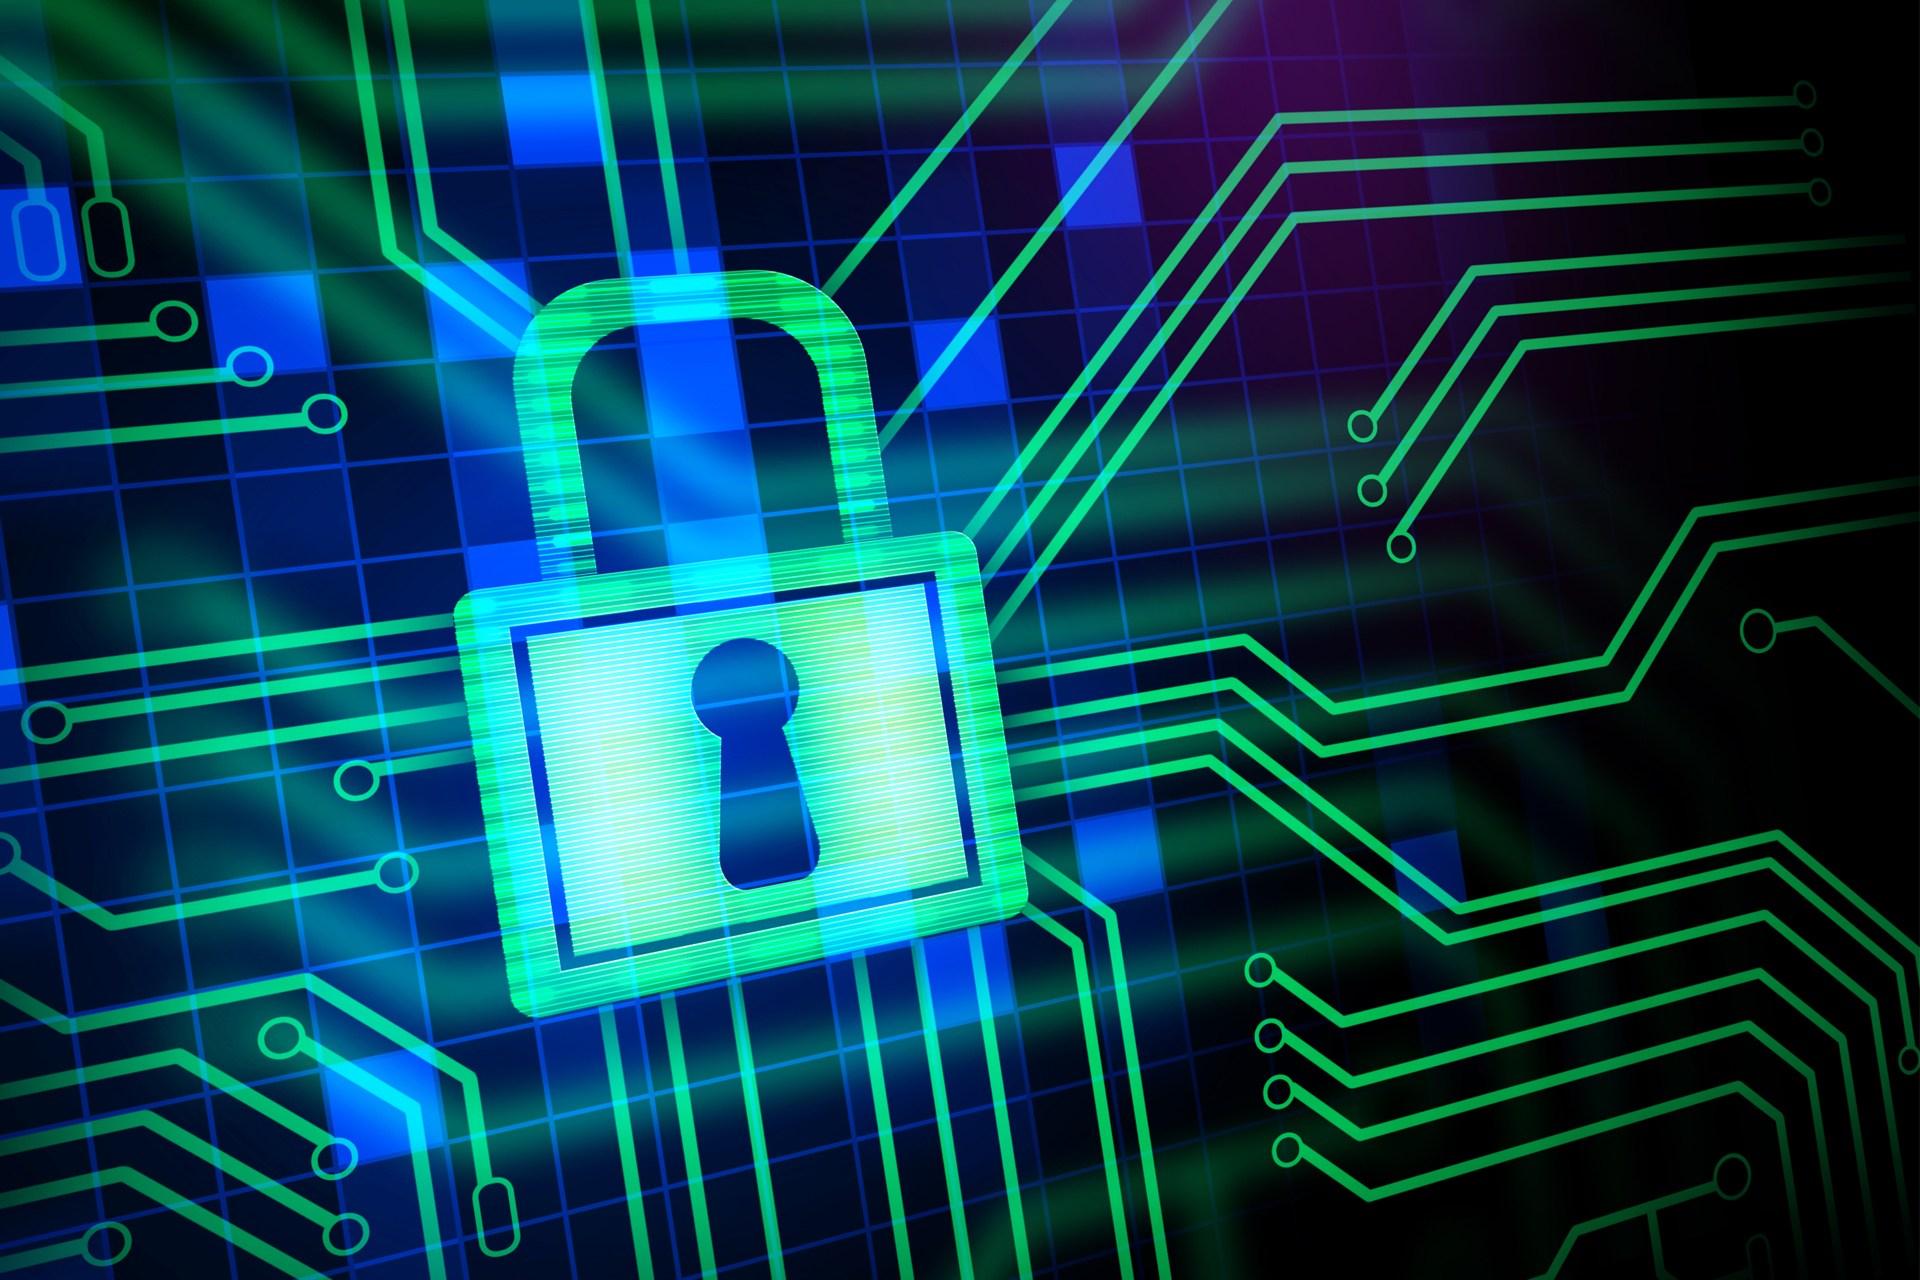 TrueCrypt Alternatives  Top Recommendations Erom Experts